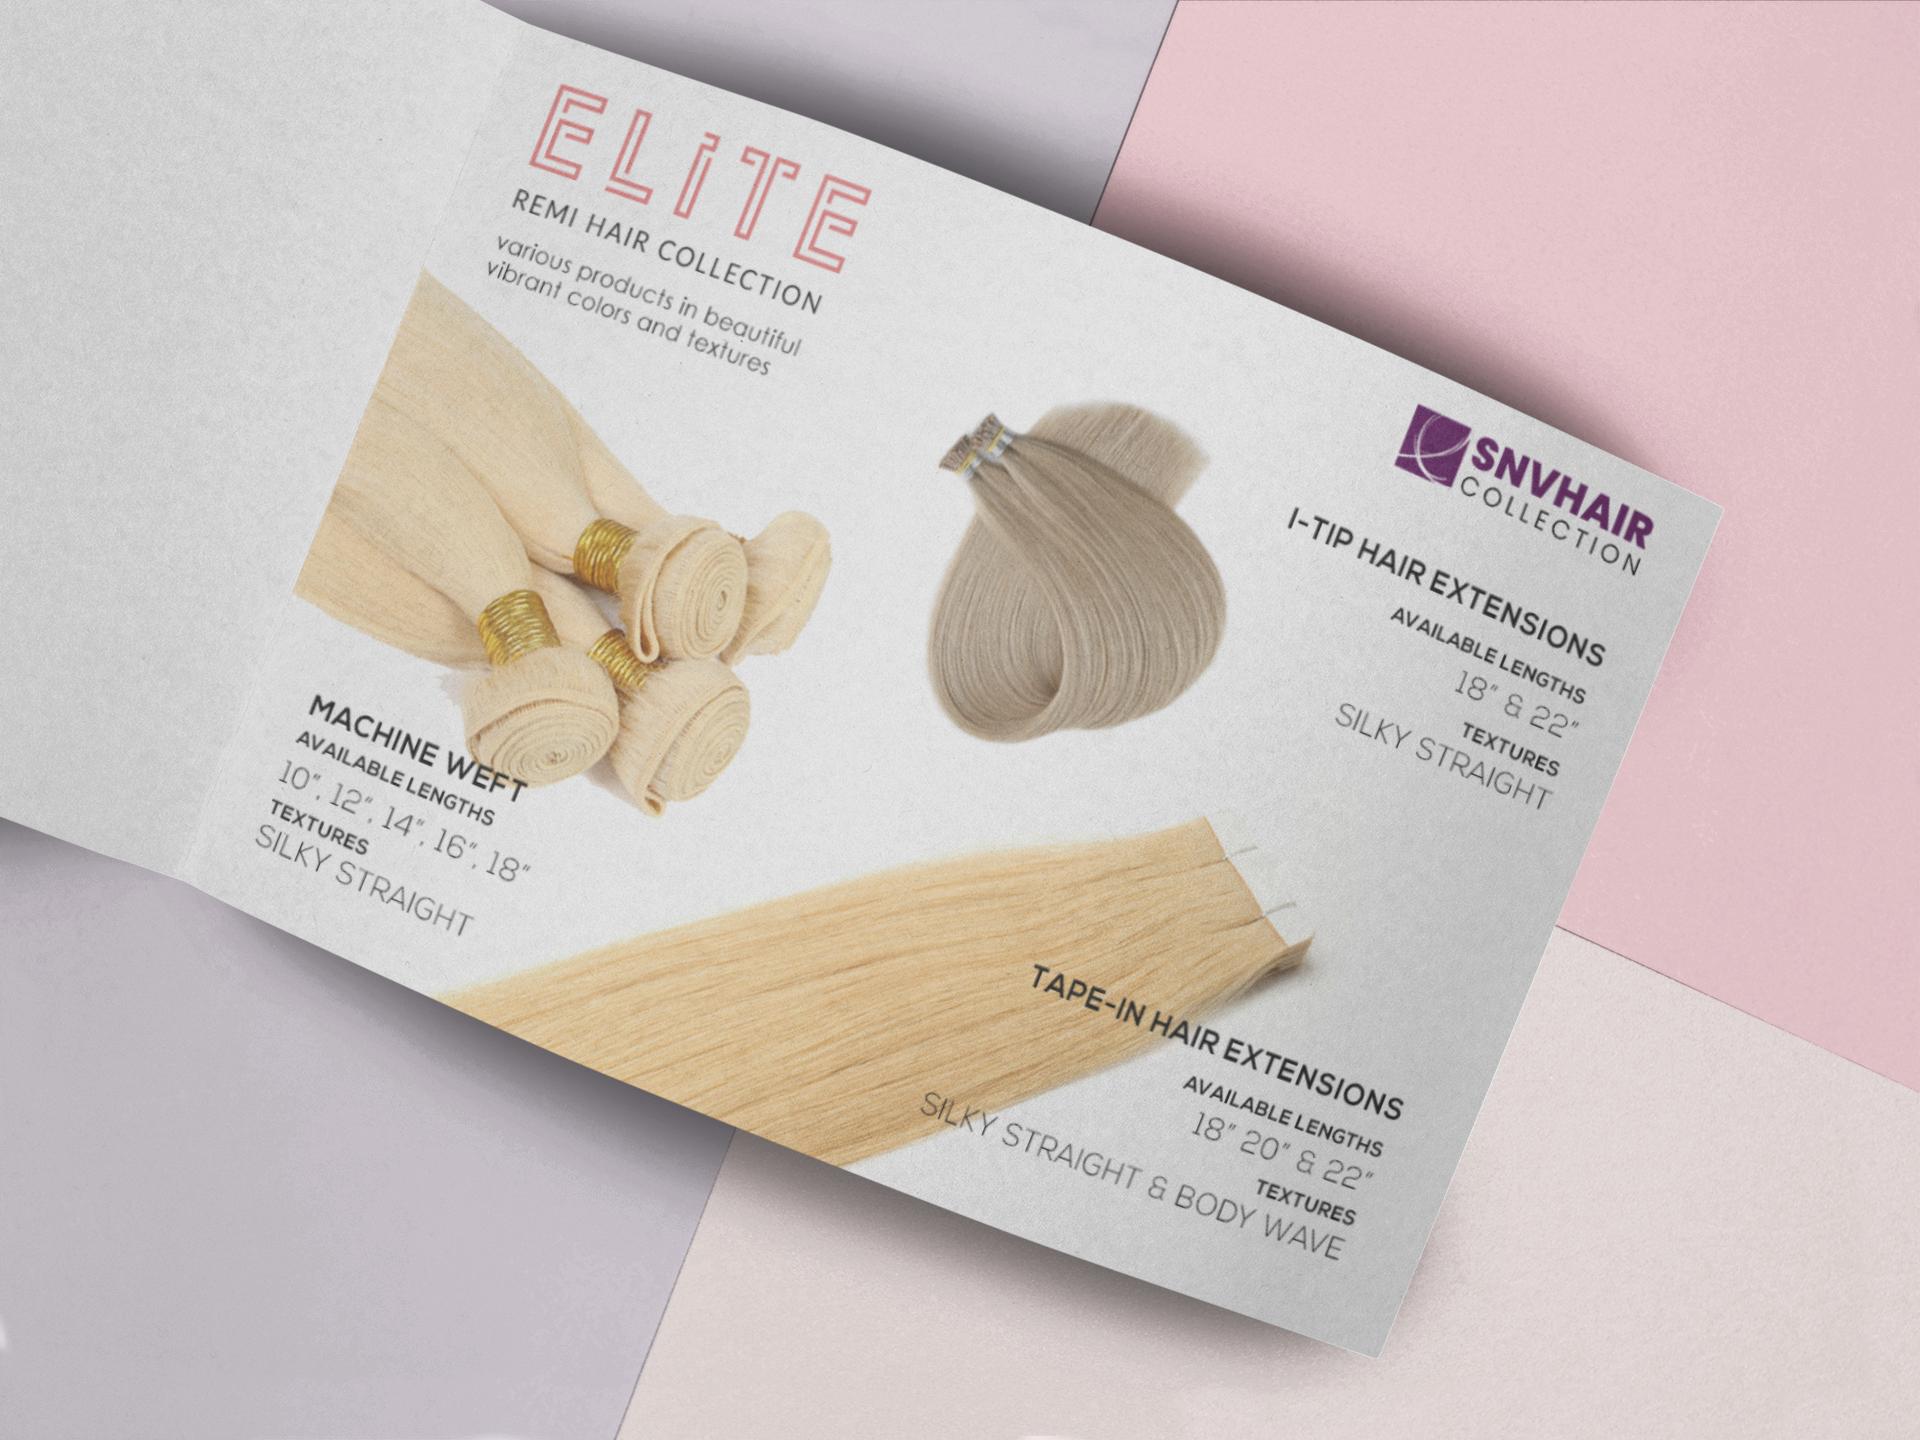 Elite Hair Collection